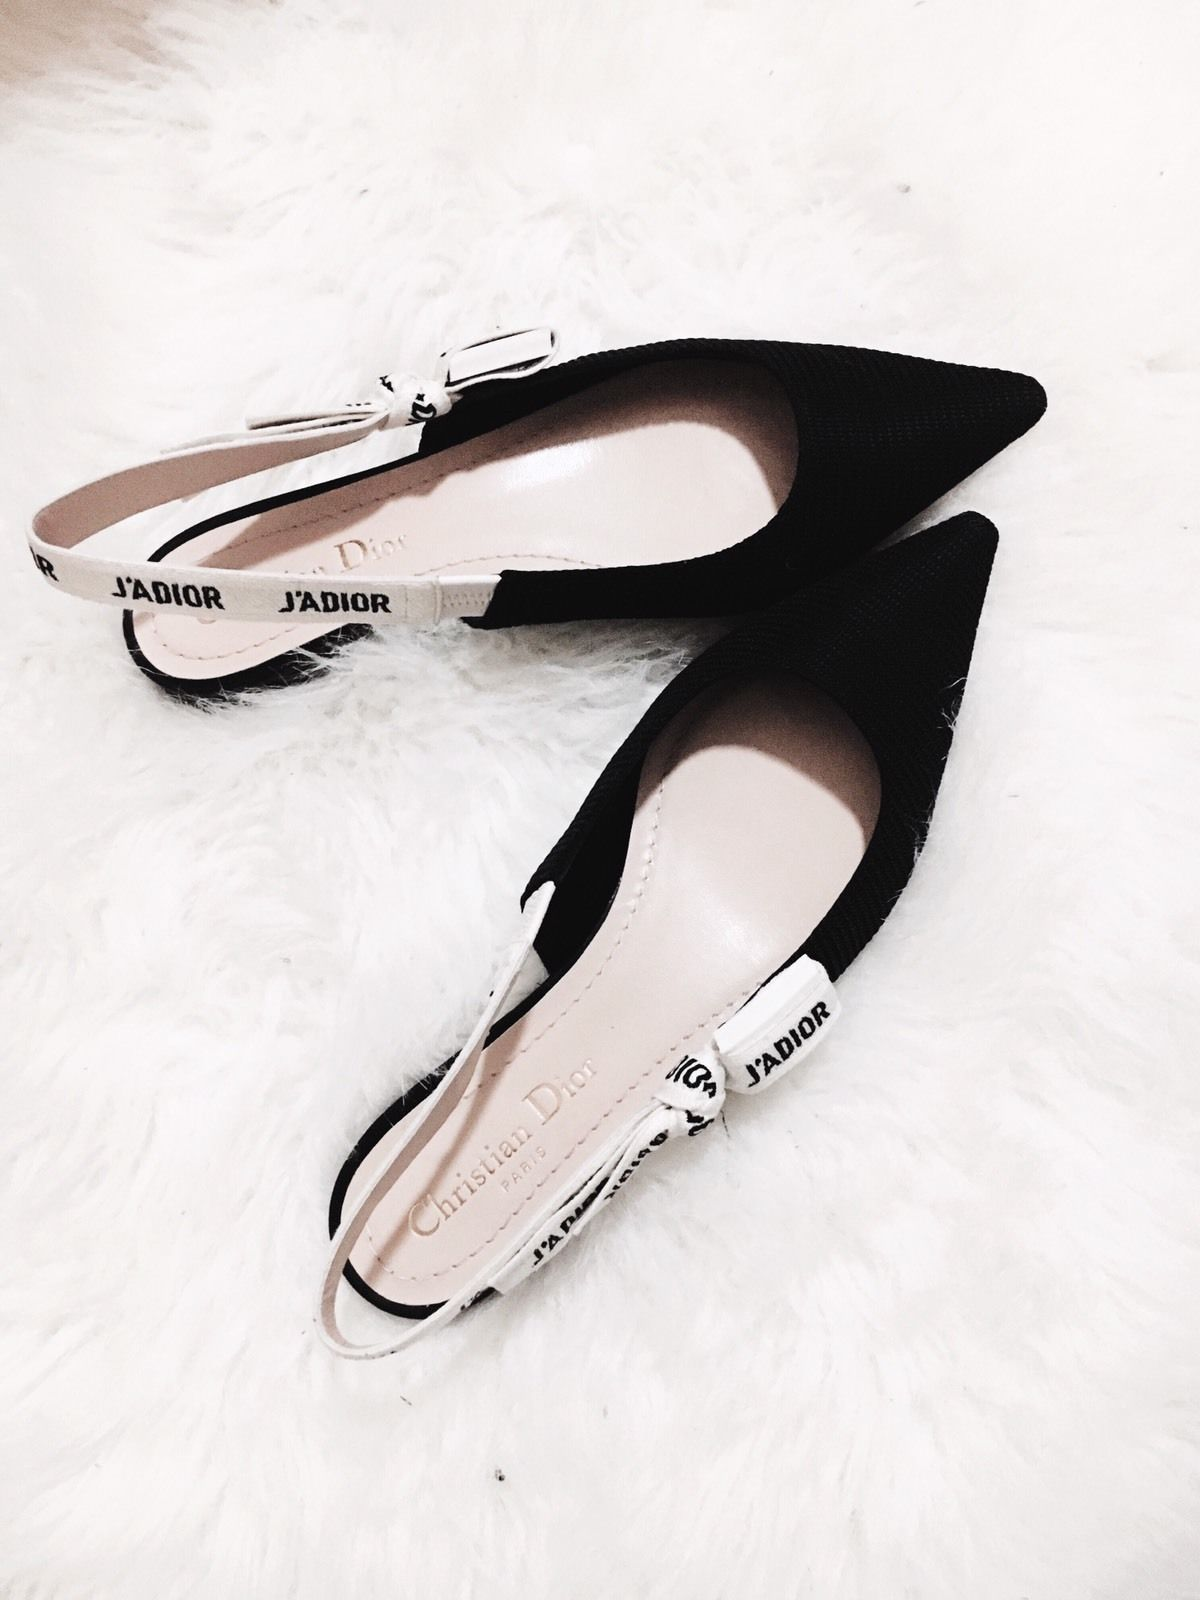 39ee02cd11 Brand New Christian Dior J'adior Jadior Black Flat Slingback Shoes - Size 35